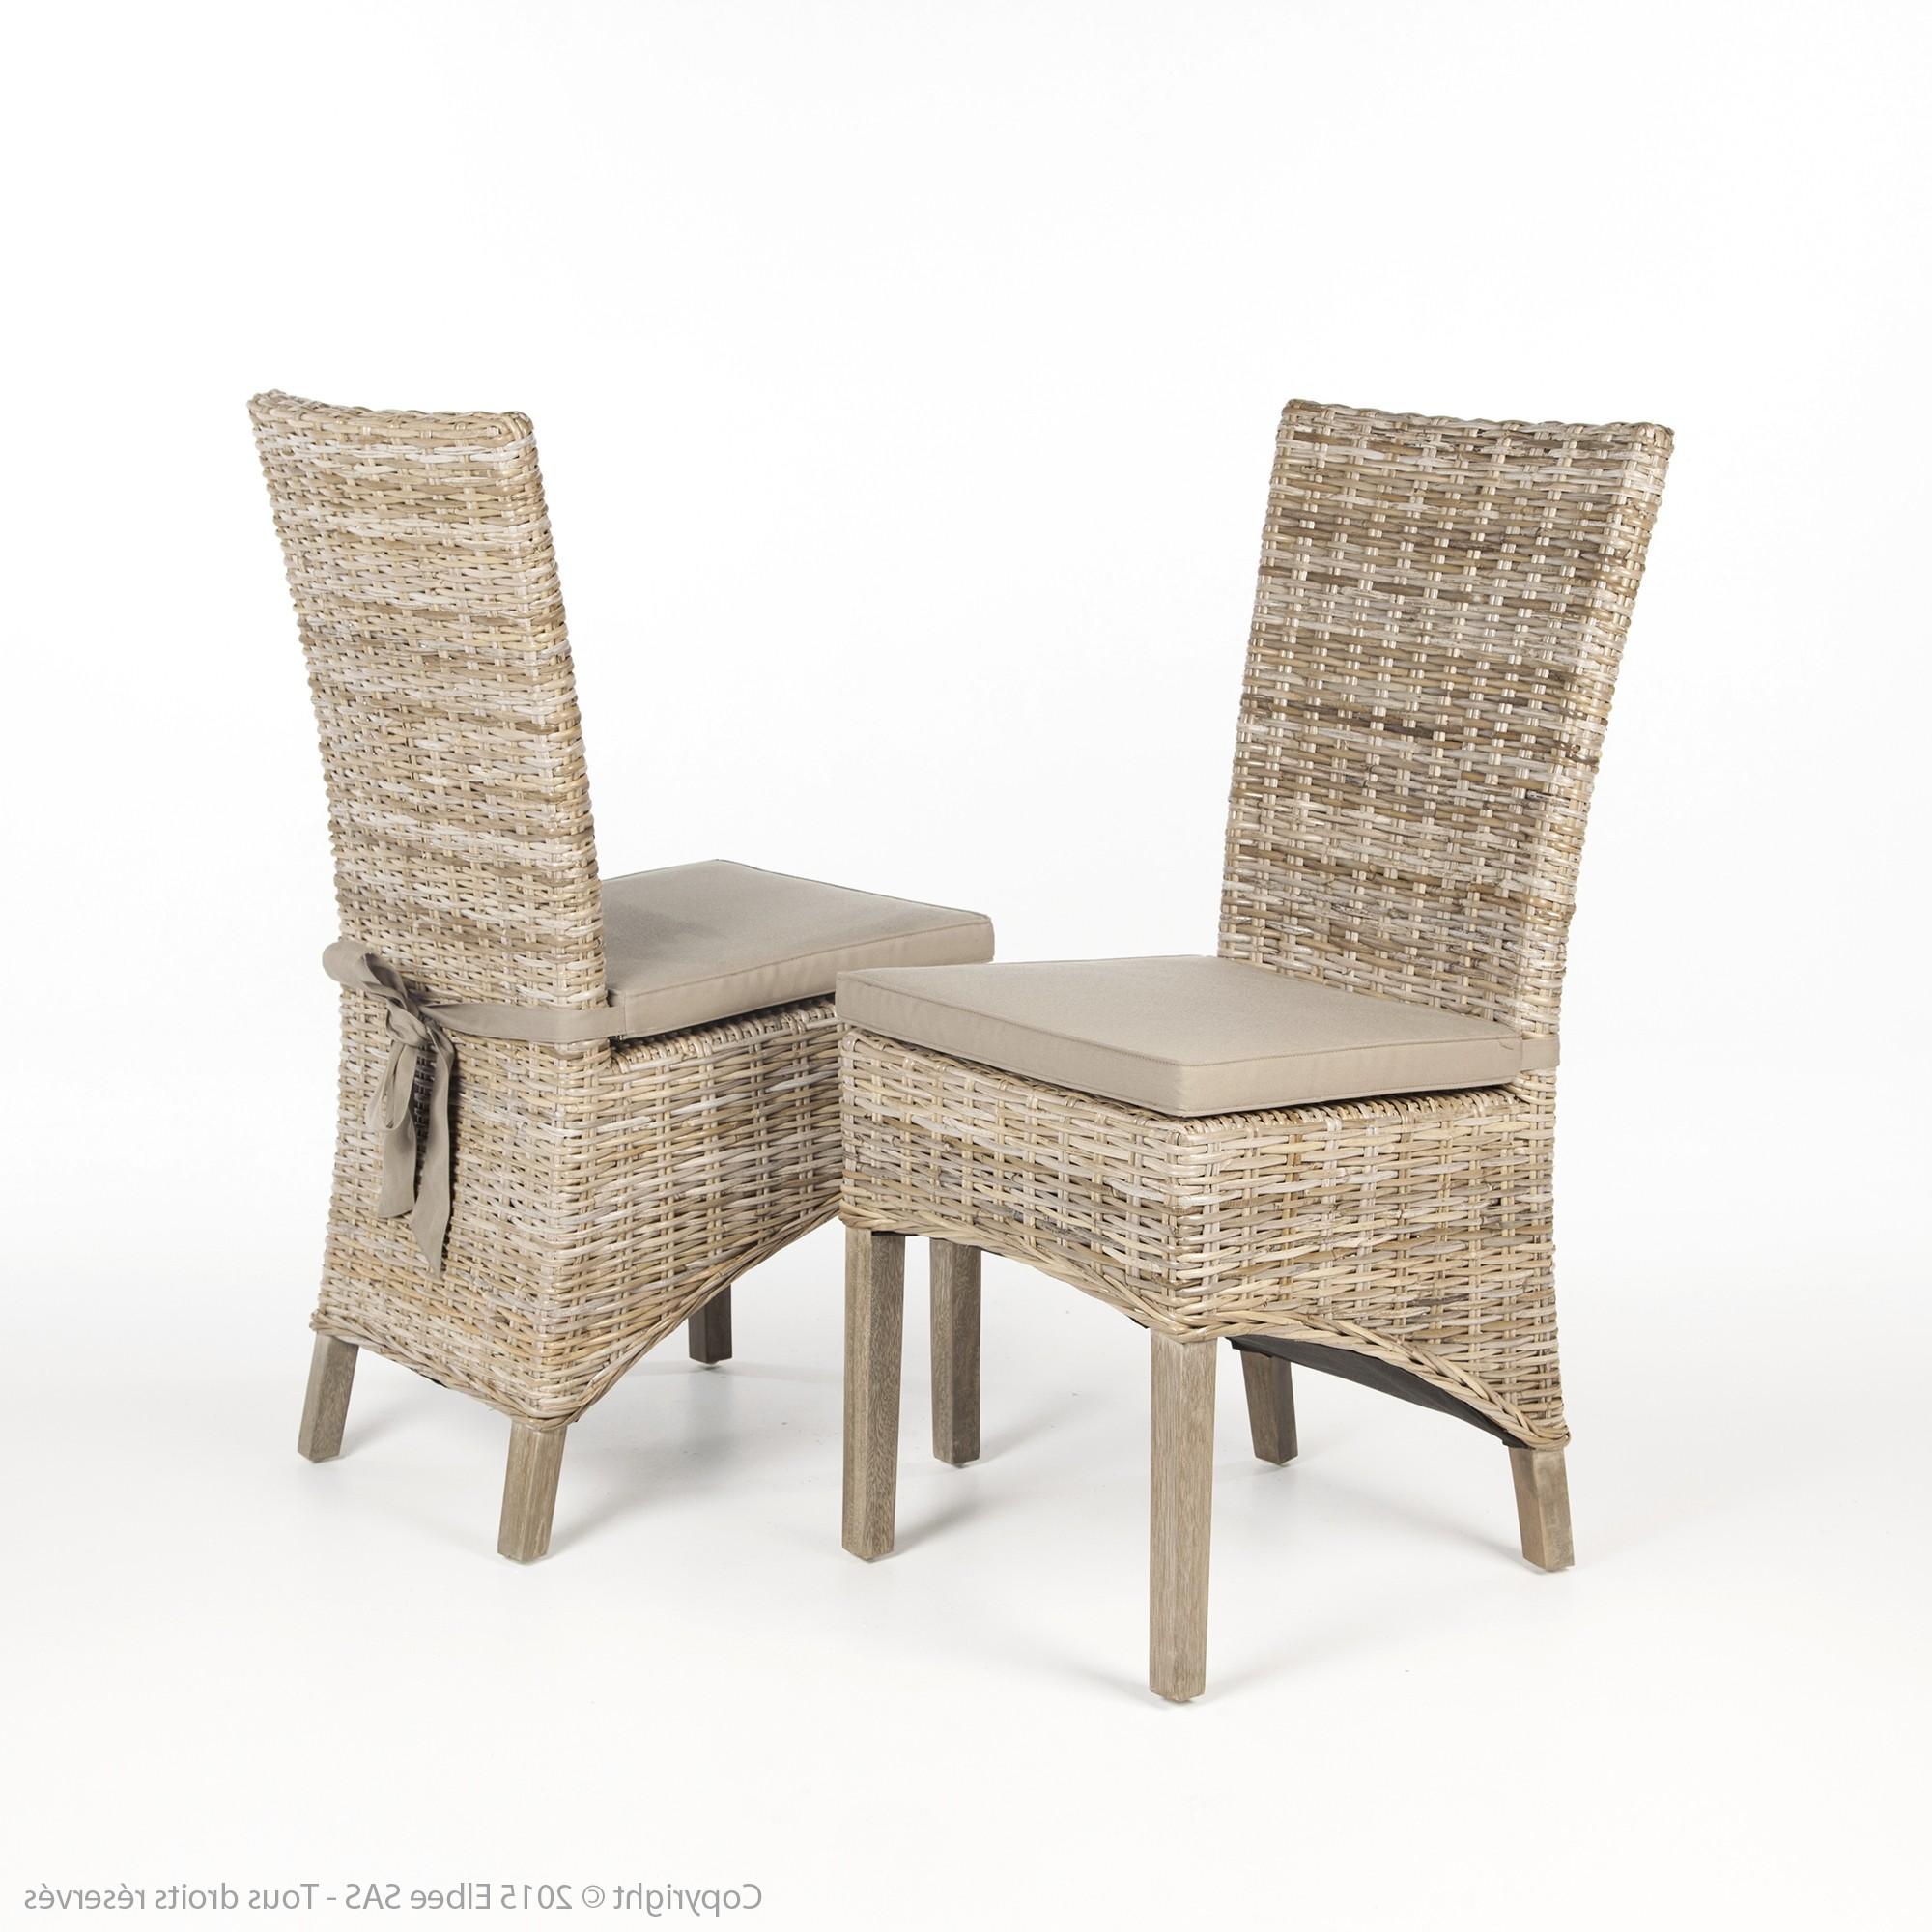 Chaise en kubu tress chaise id es de d coration de - Chaise en kubu tresse ...